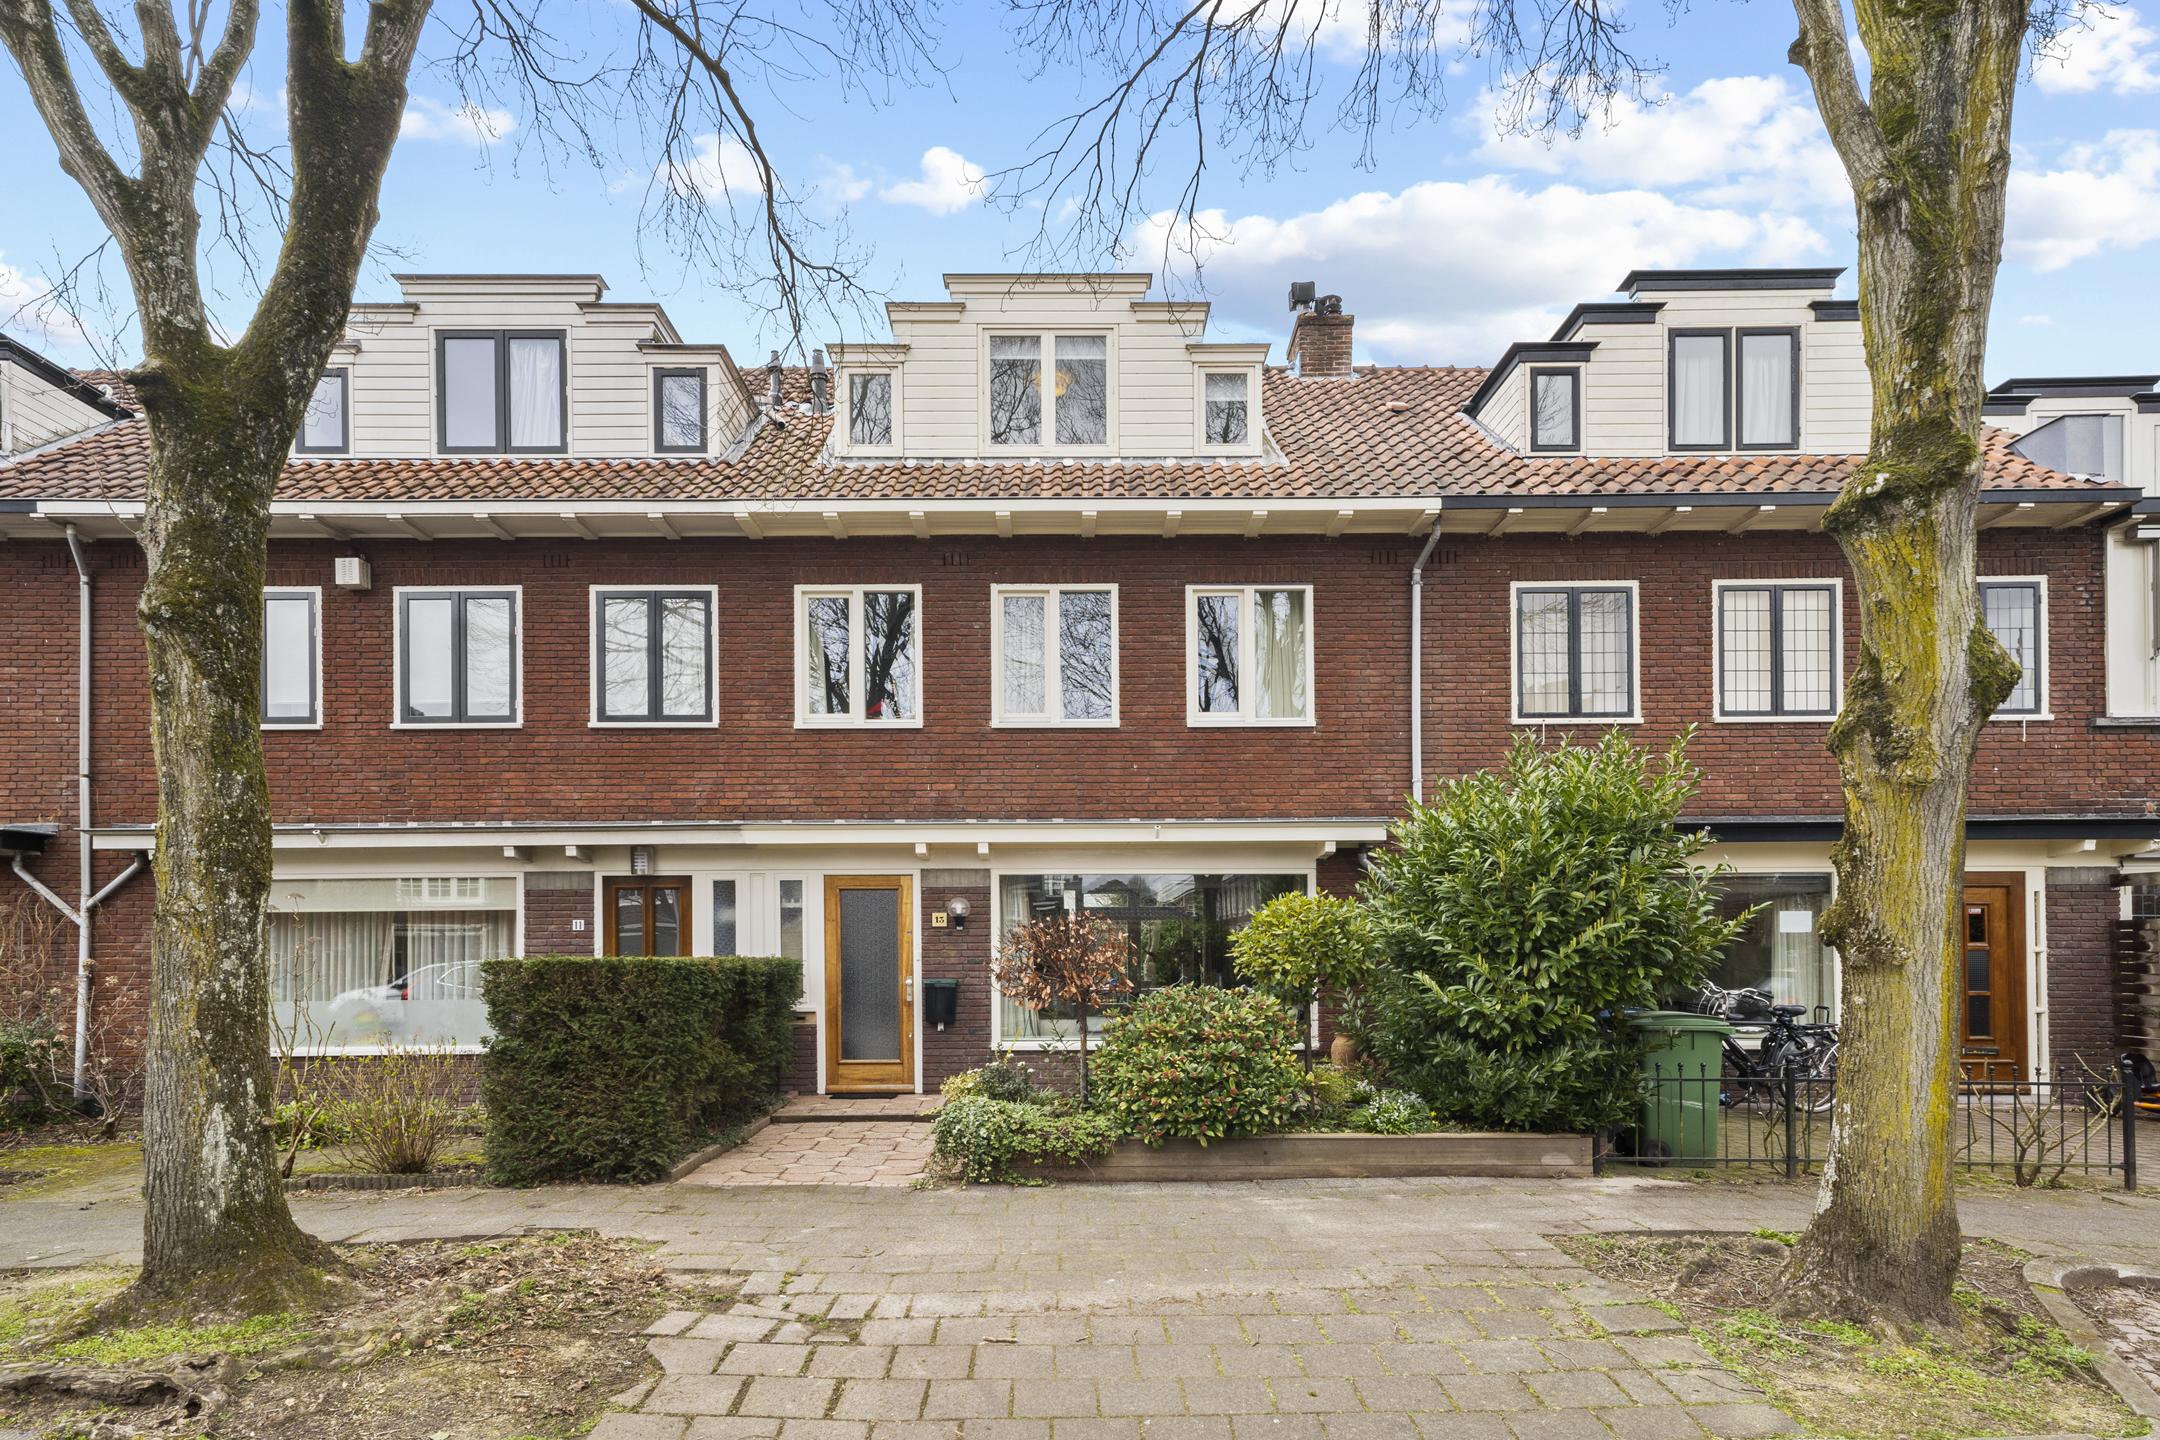 Lunshof makelaars Amstelveen en Amsterdam - Rijnier Pauwlaan 13  Amstelveen